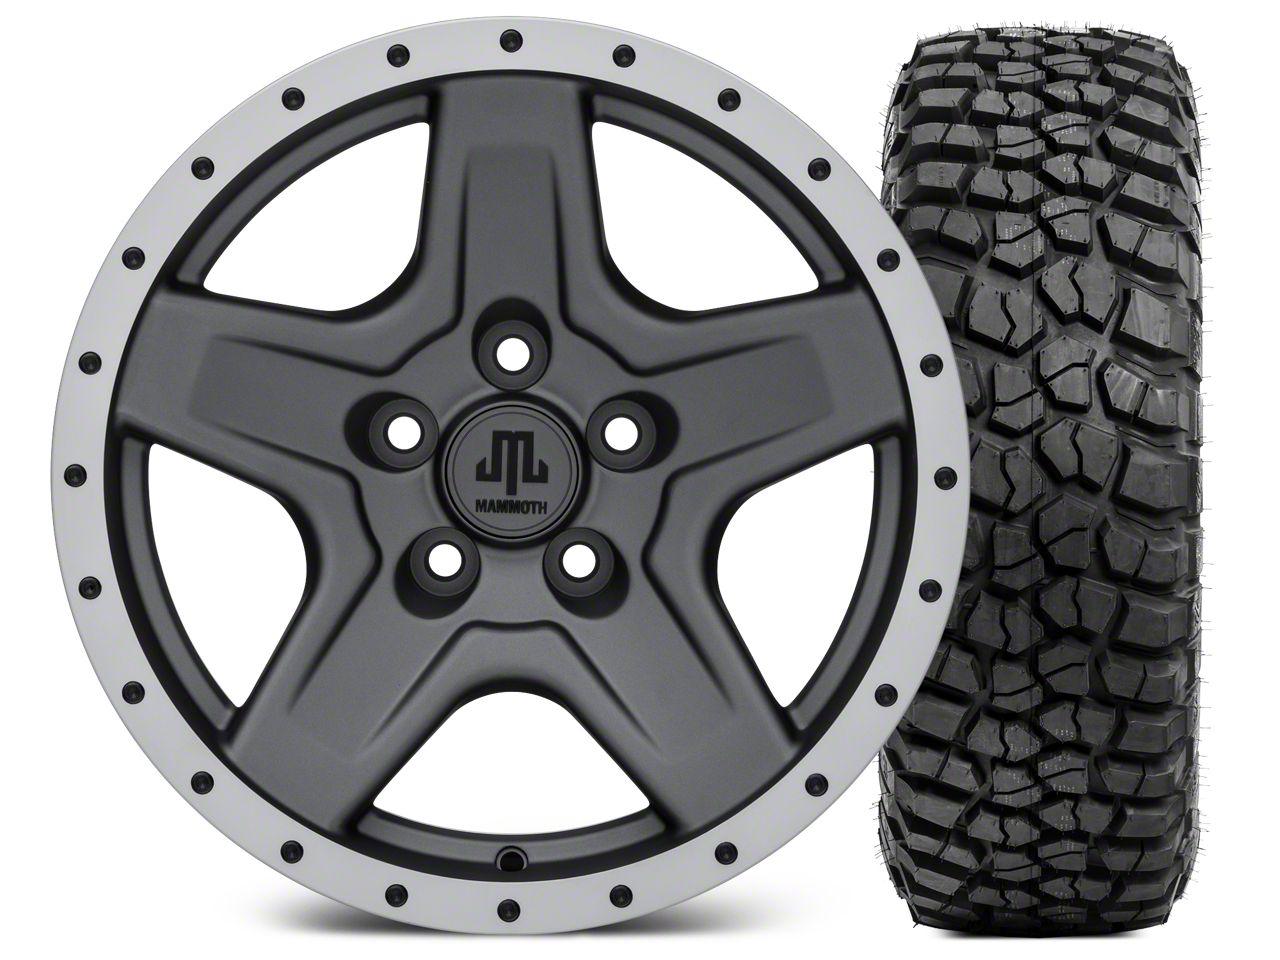 Mammoth Boulder Beadlock Style Charcoal 16x8 Wheel & BFG KM2 315/75- 16 Tire Kit (87-06 Jeep Wrangler YJ & TJ)